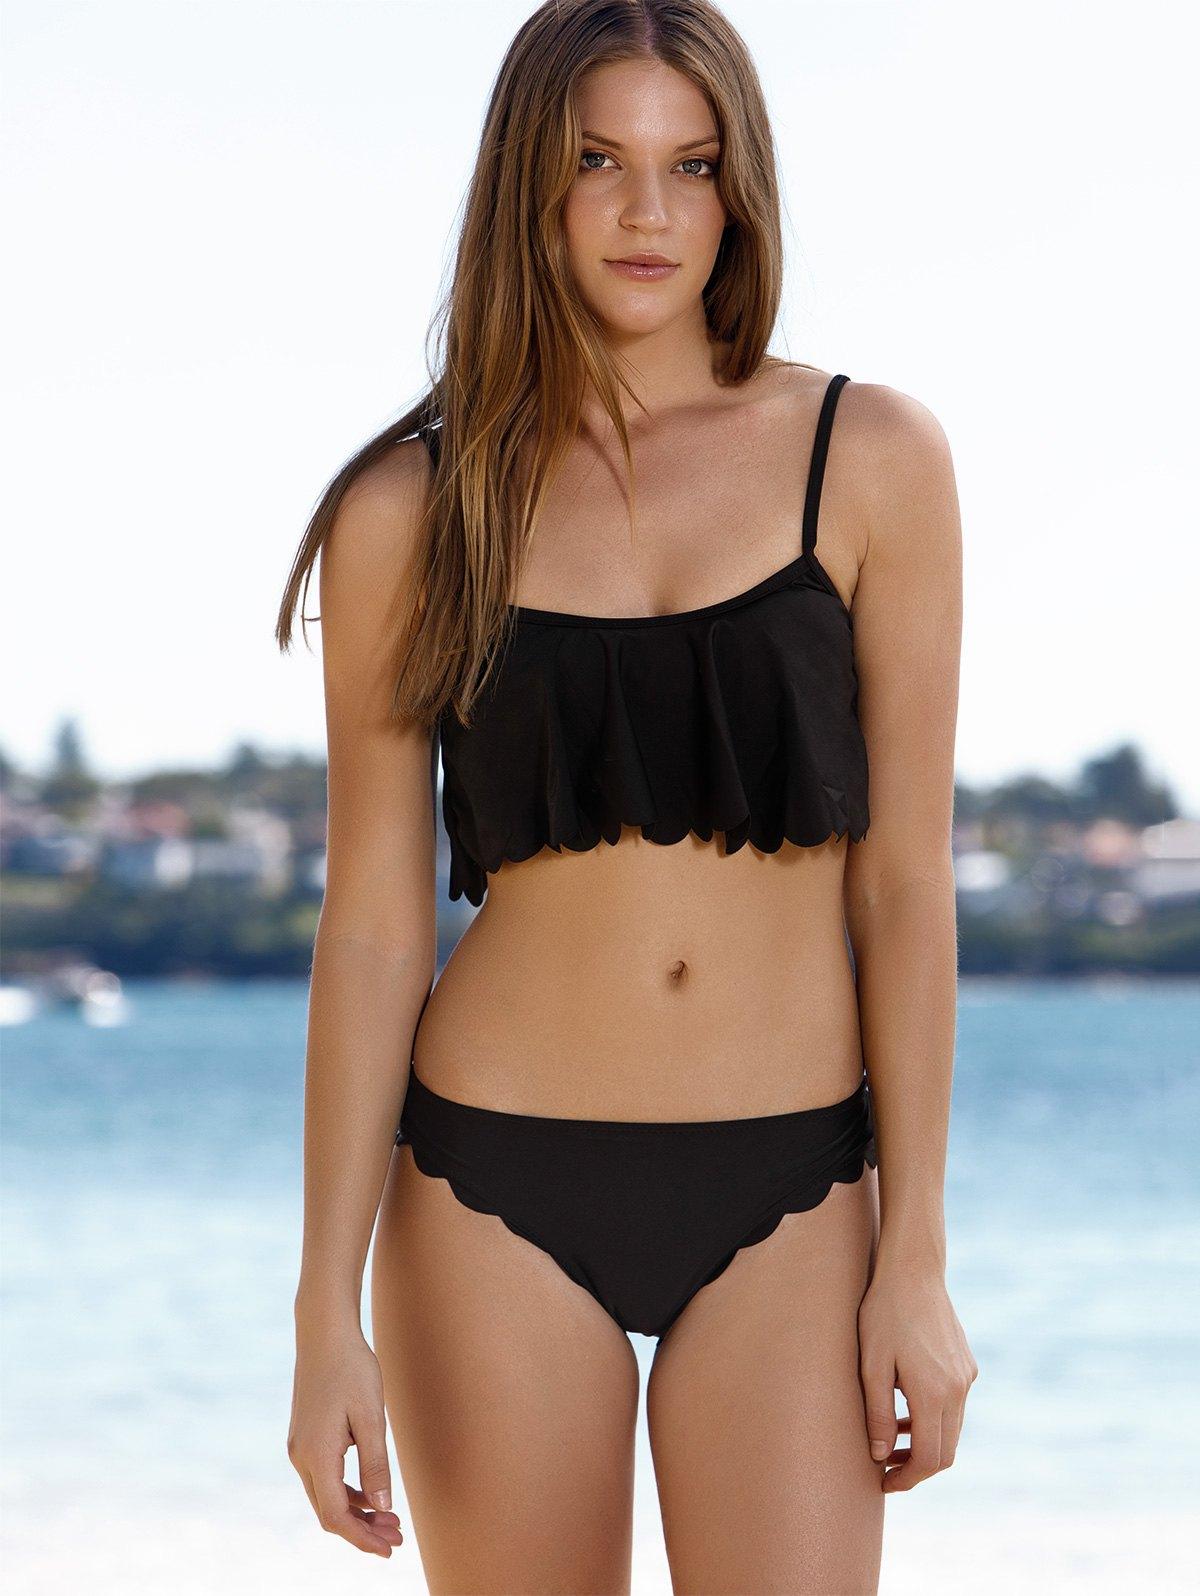 Cami Black Ruffles Bikini Set 145909504